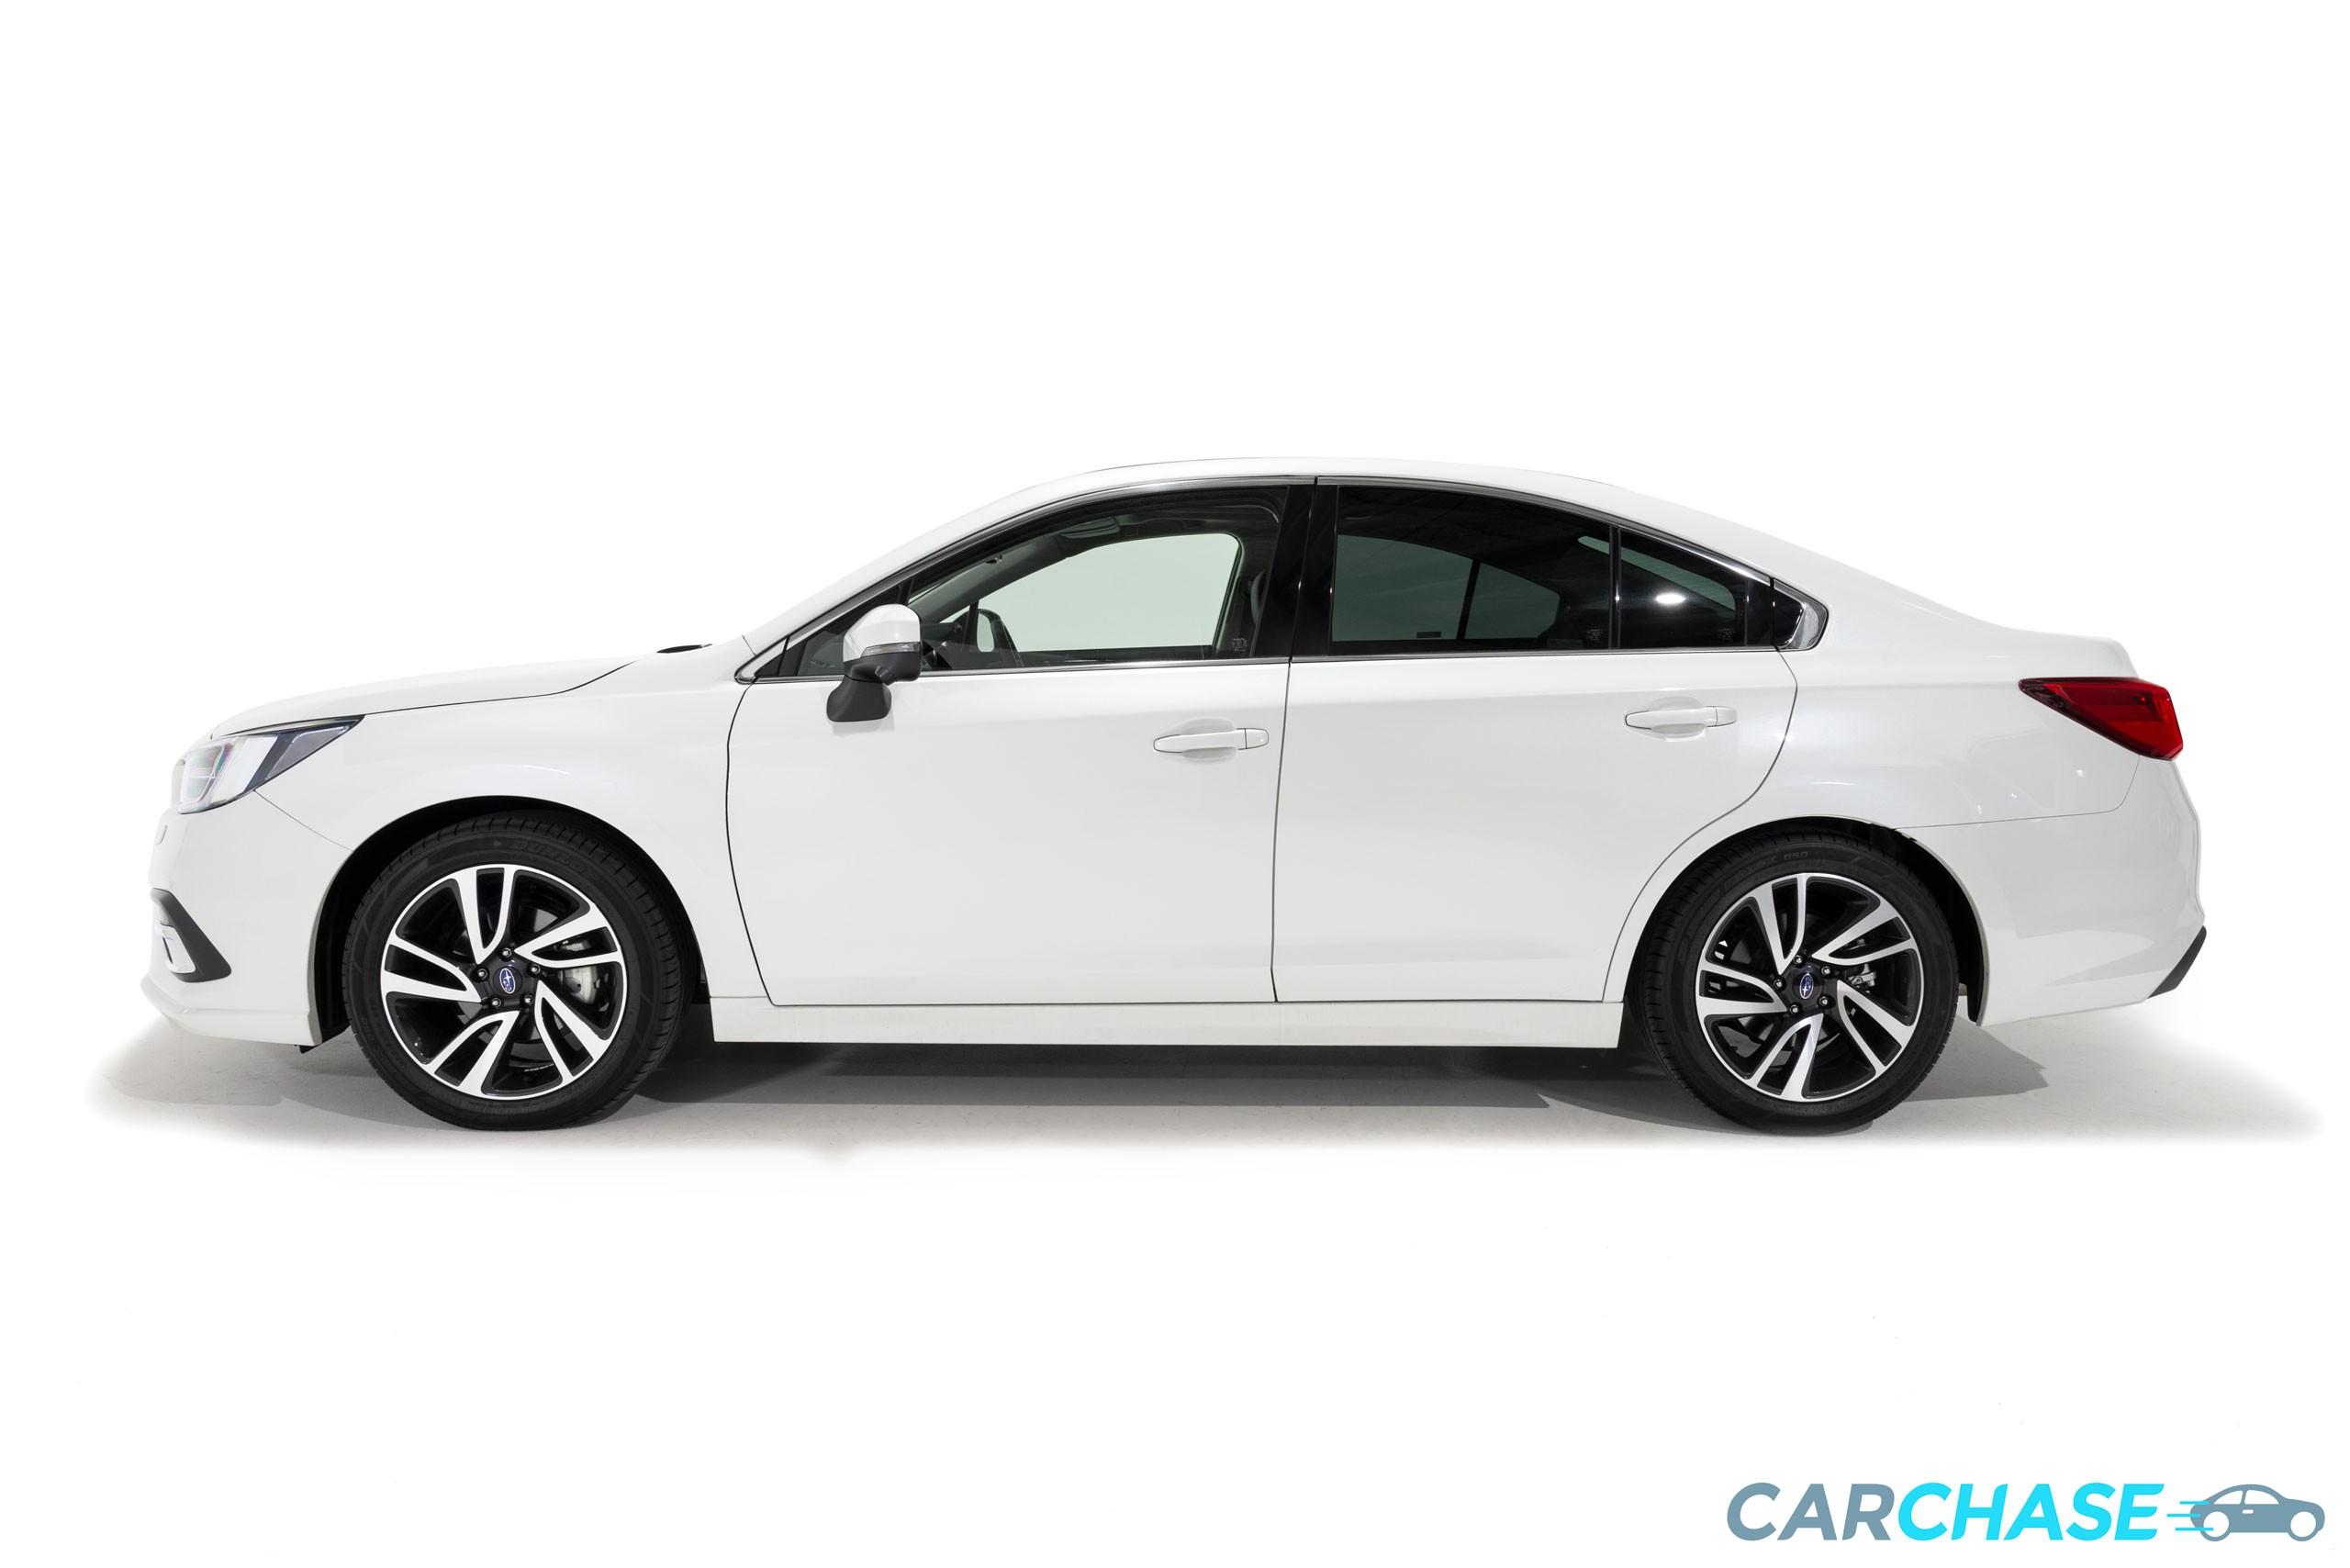 Image of left profile of 2018 Subaru Liberty 2.5i Premium